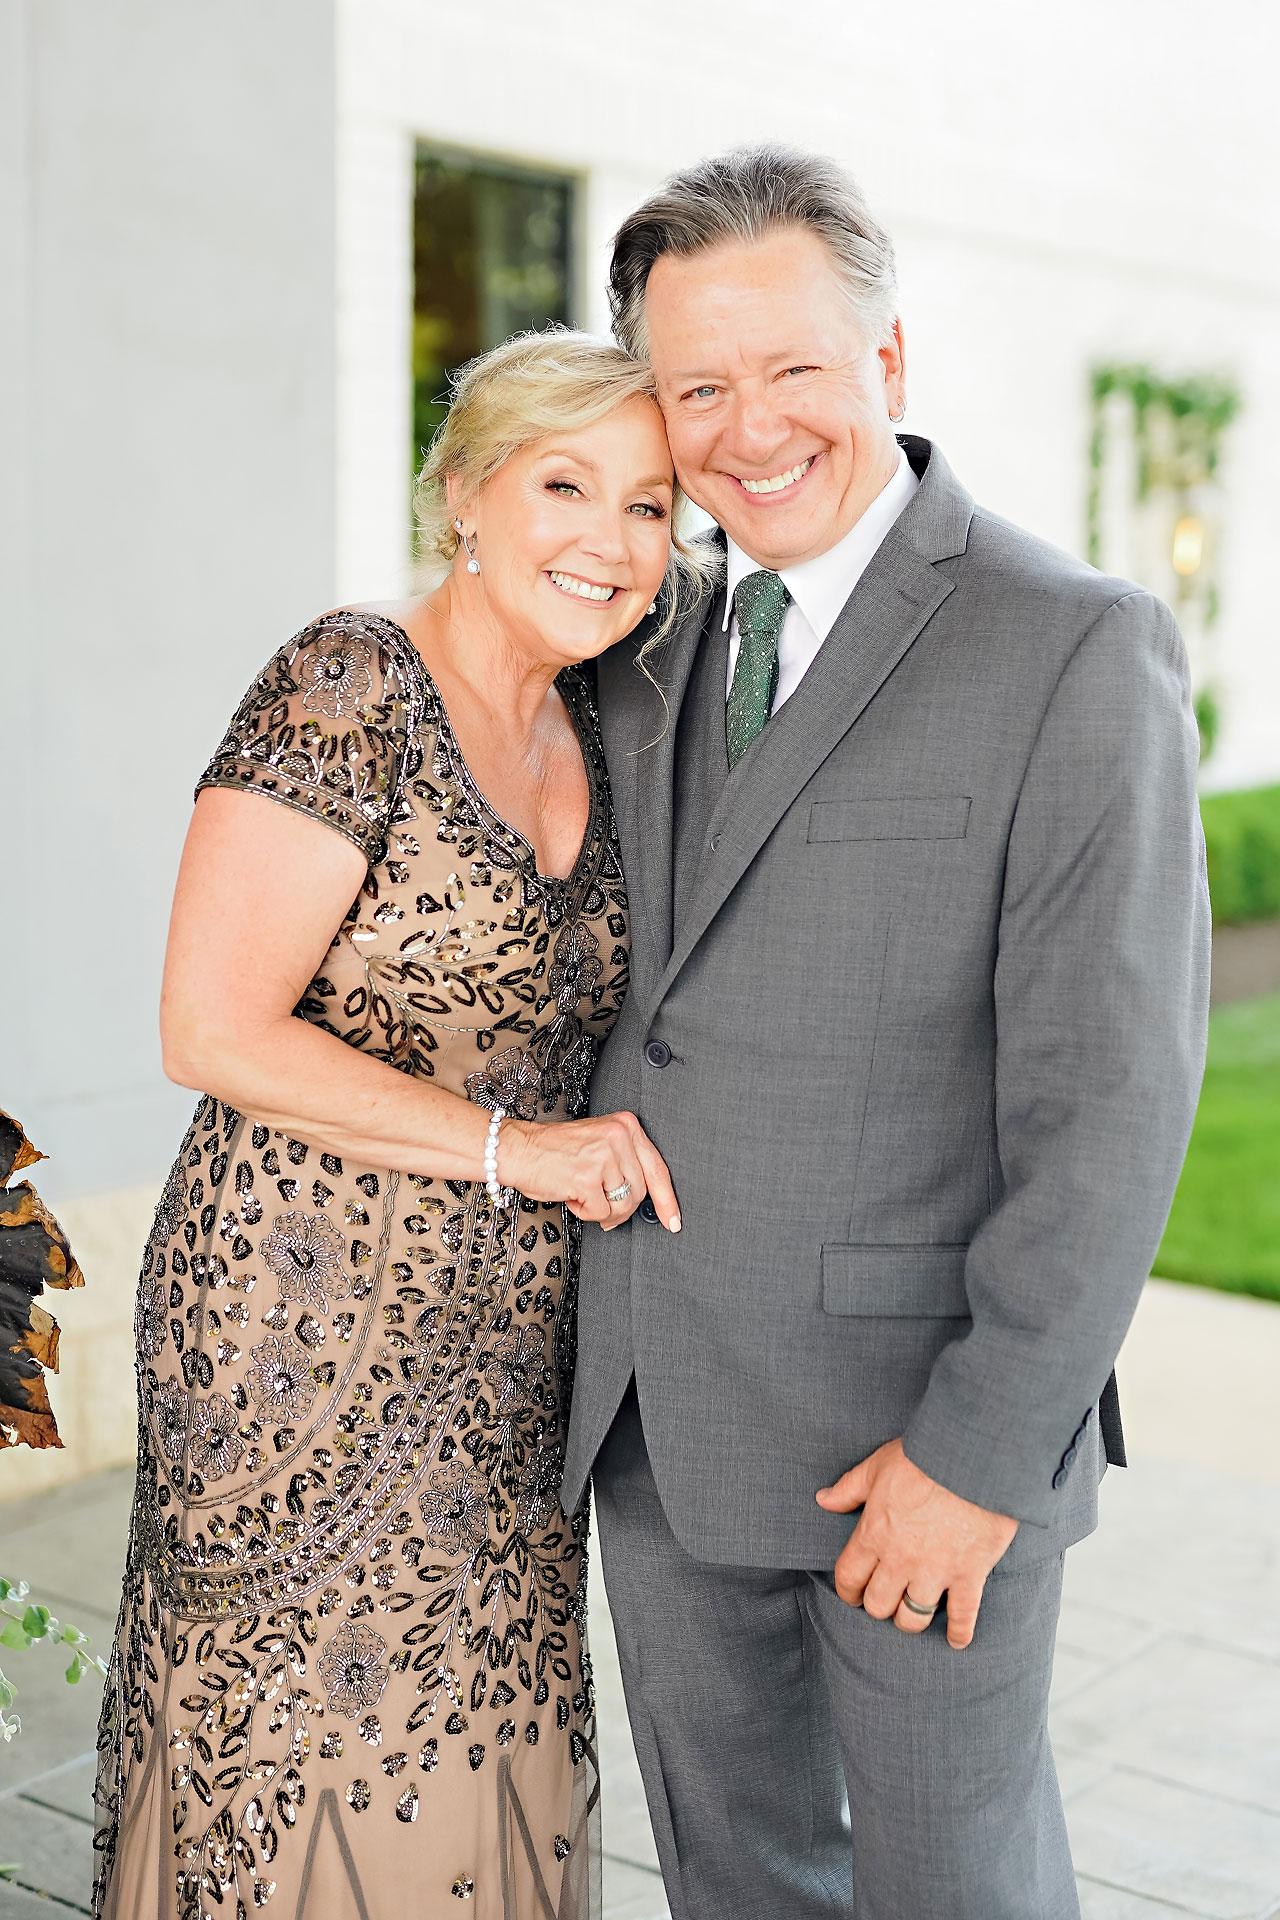 Brylie Jackson Ritz Charles Carmel Indiana Wedding Reception 024